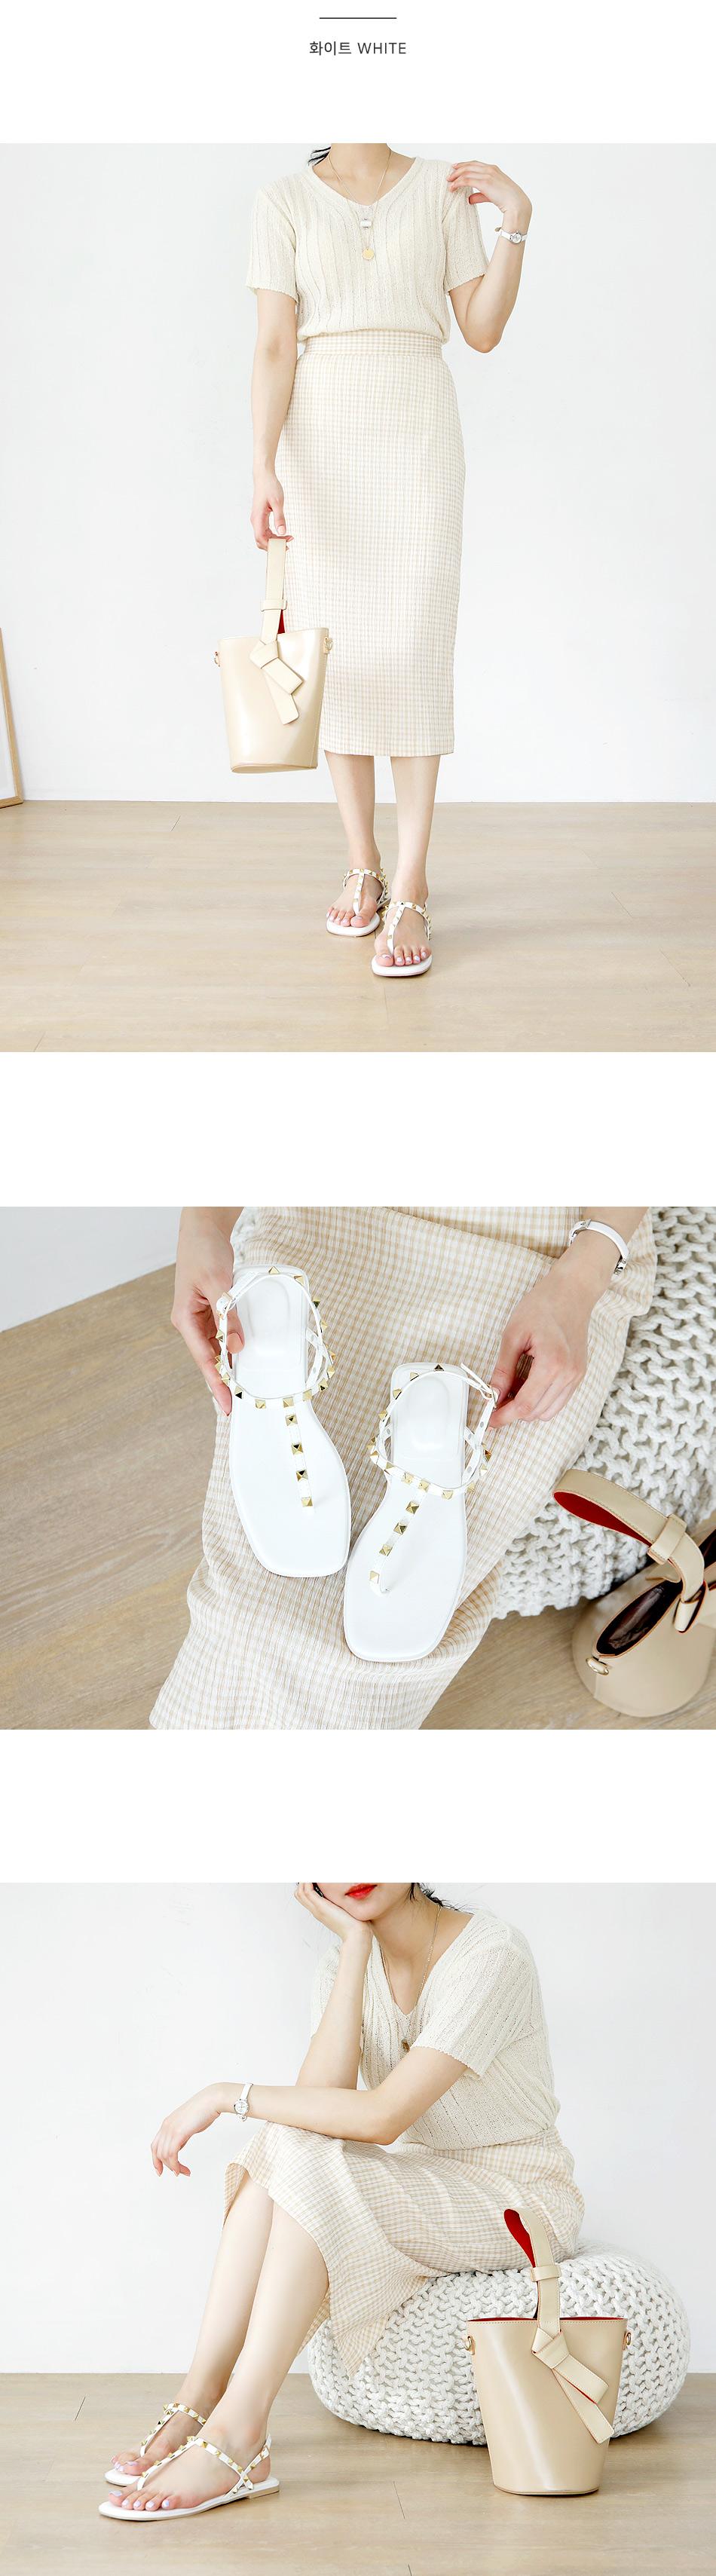 Kefir stud slingback sandals 1 cm